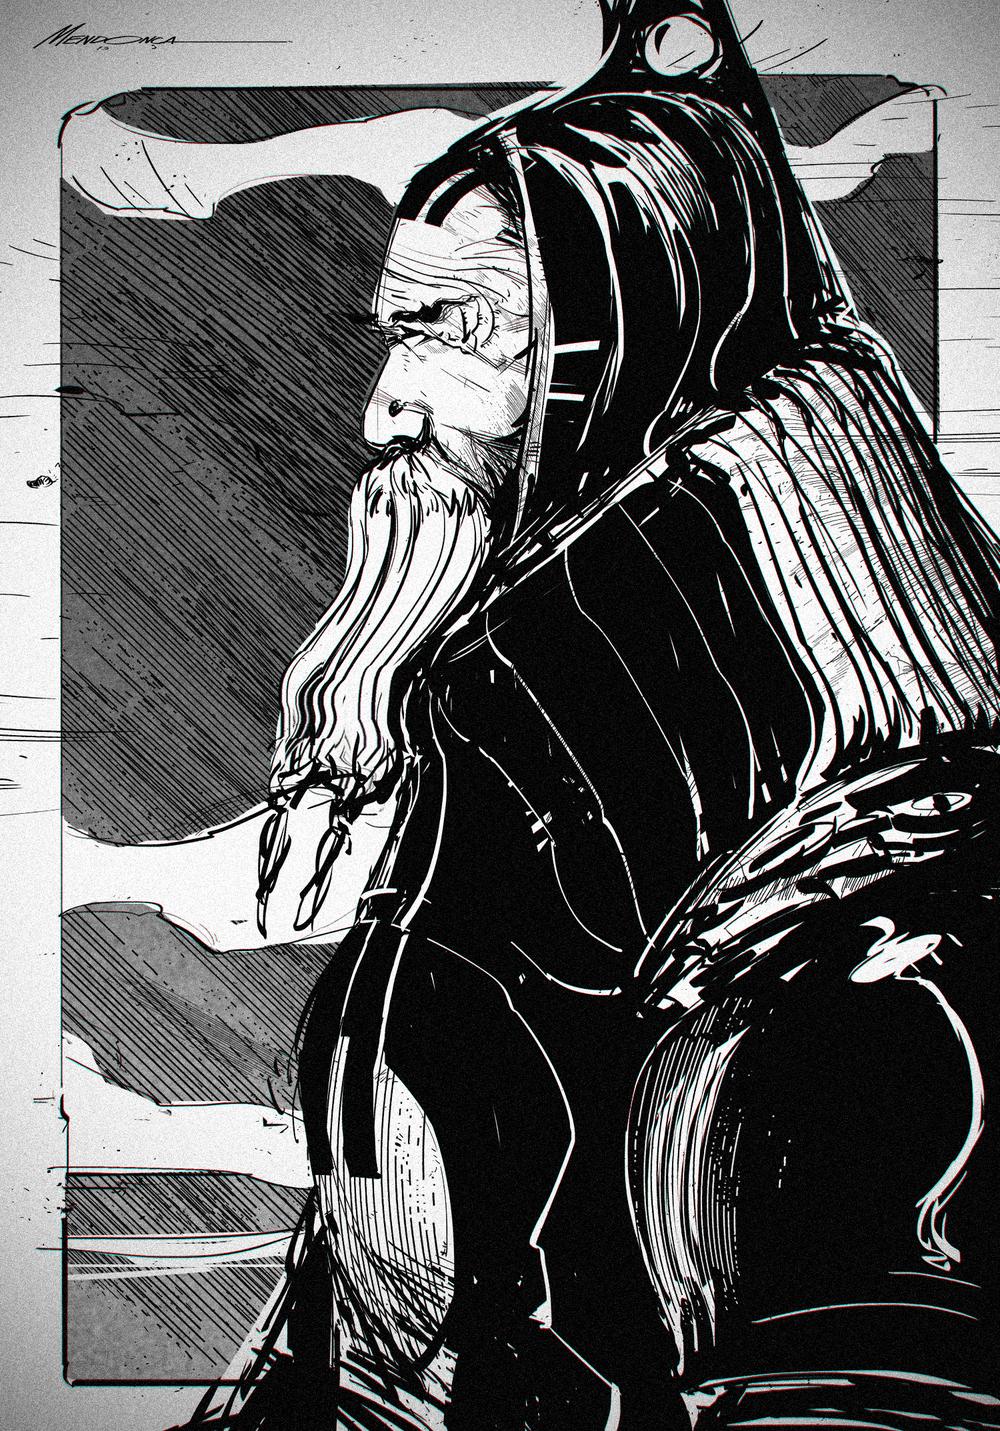 05_Monk.jpg